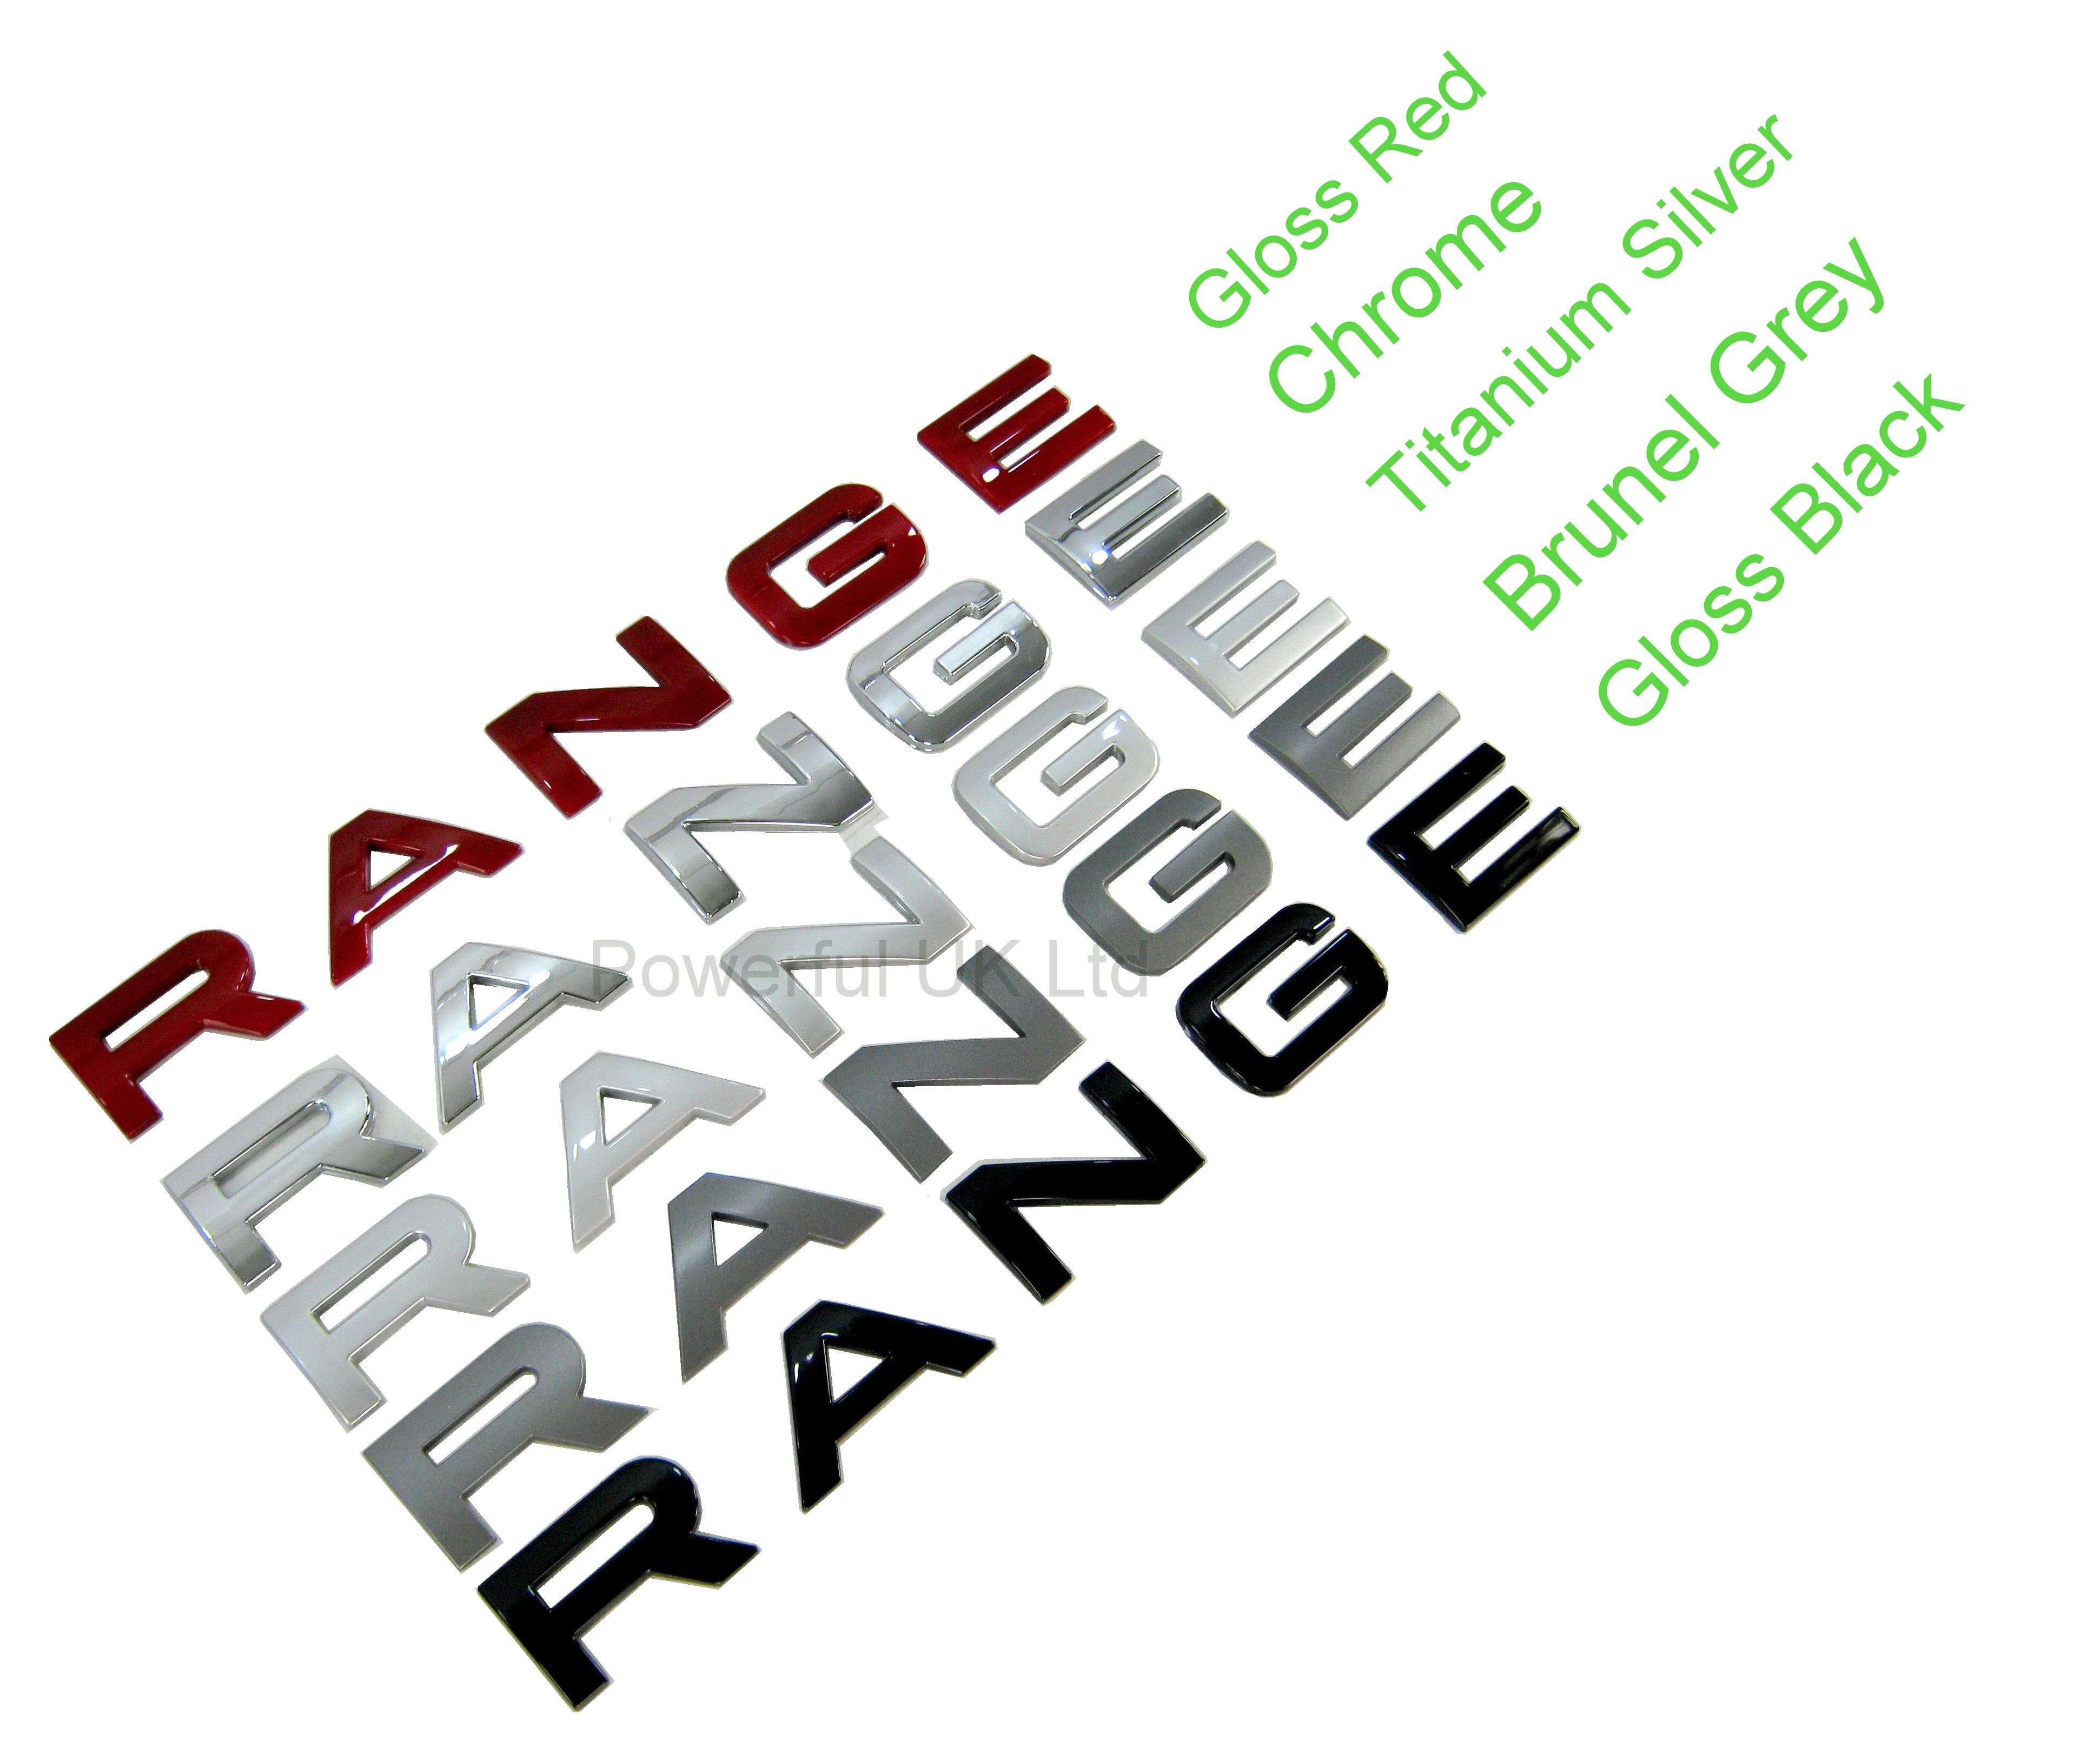 range rover logo vector. item specifics range rover logo vector t